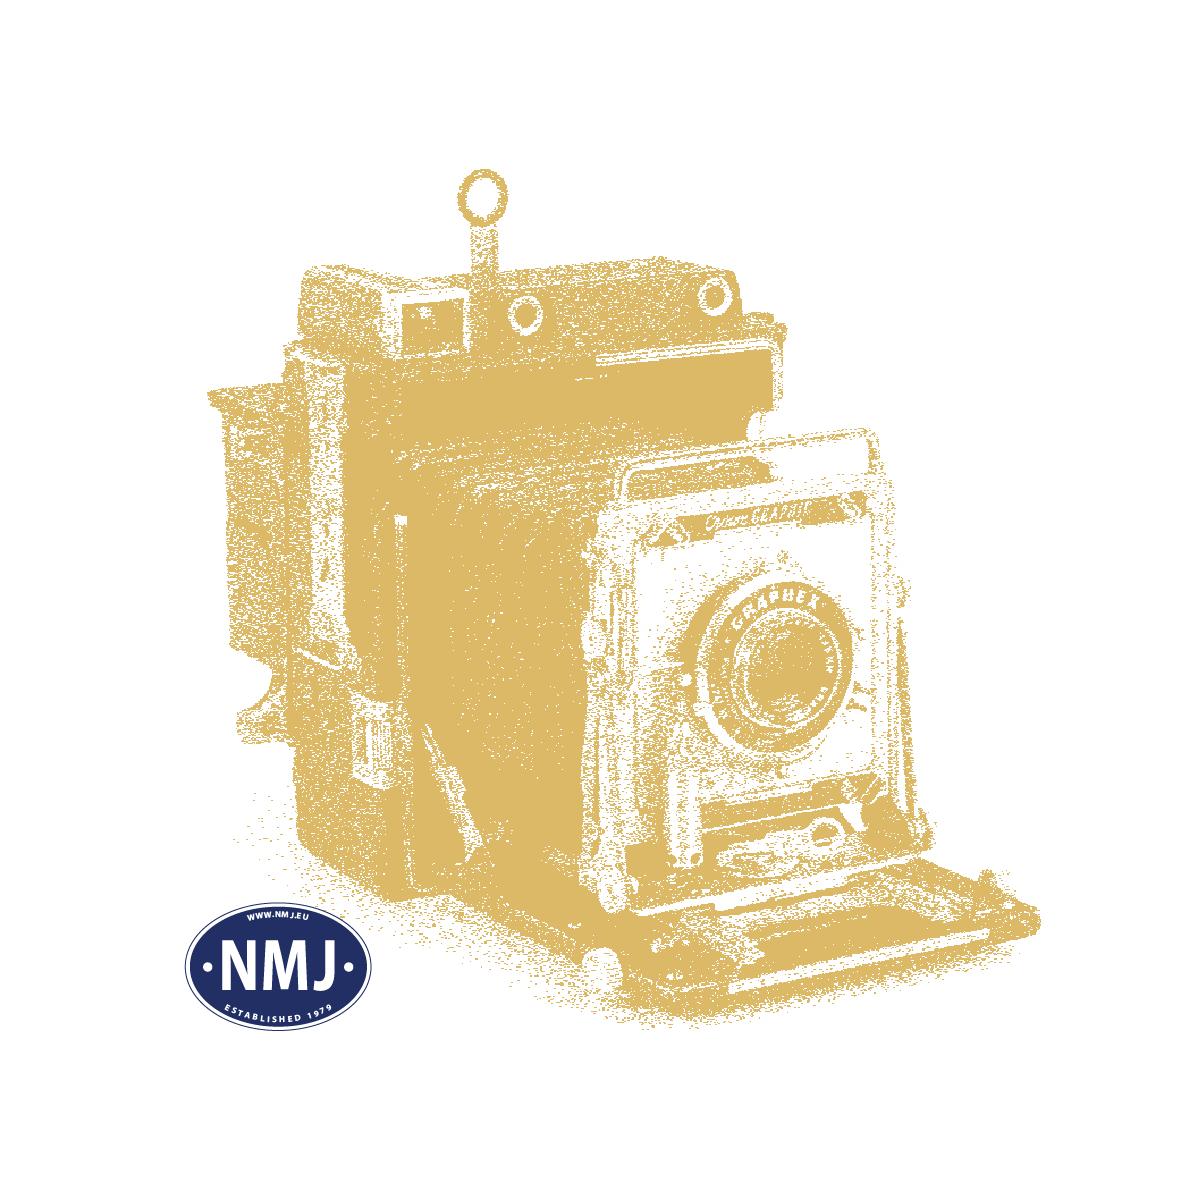 NMJT86.301AC - NMJ Topline NSB El11.2104, Red/Silver, AC Digital